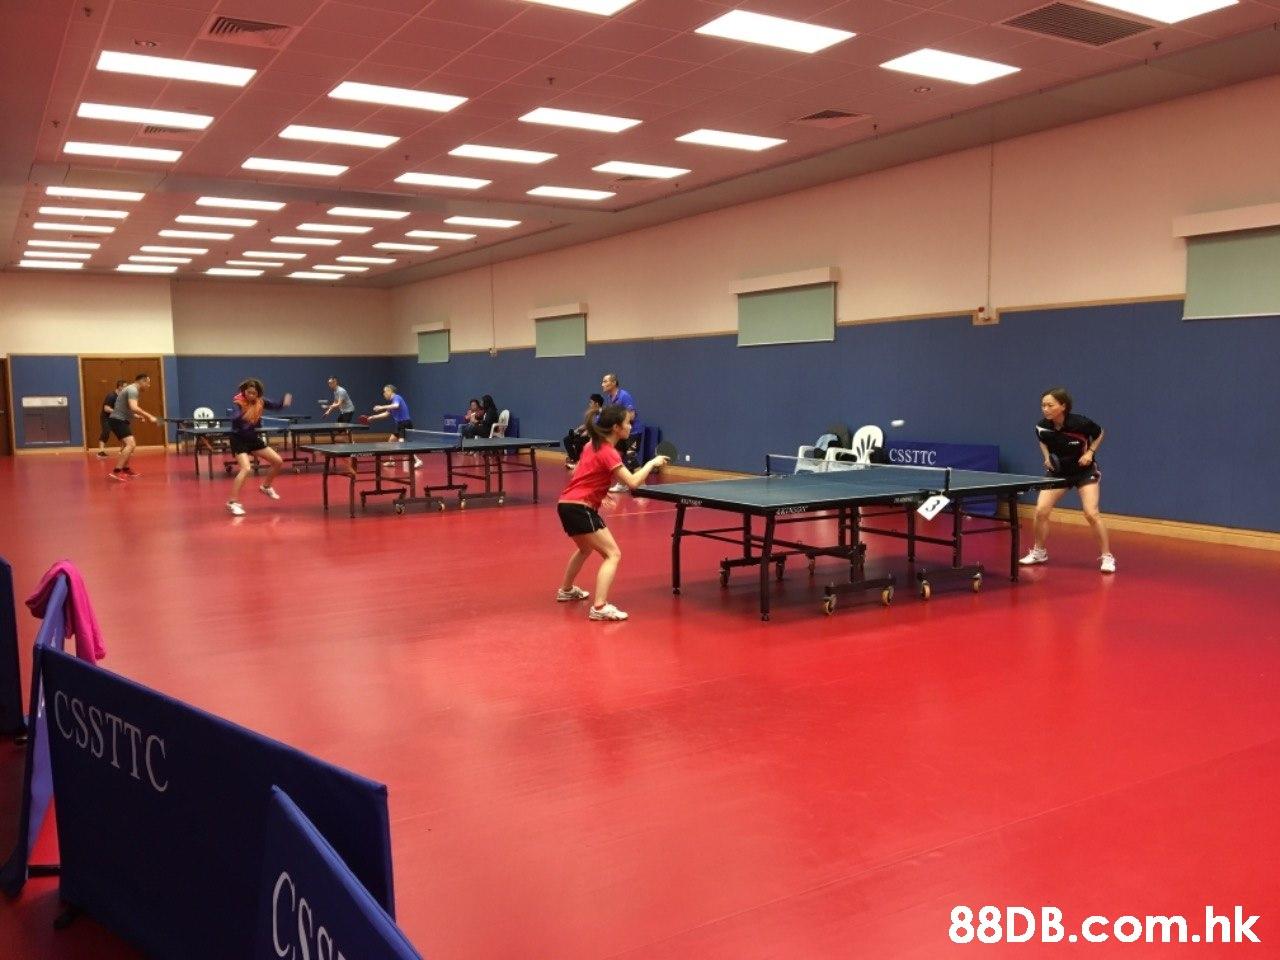 CSSTTC CSSTTC .hk  Sports,Ping pong,Racquet sport,Ball game,Table tennis racket